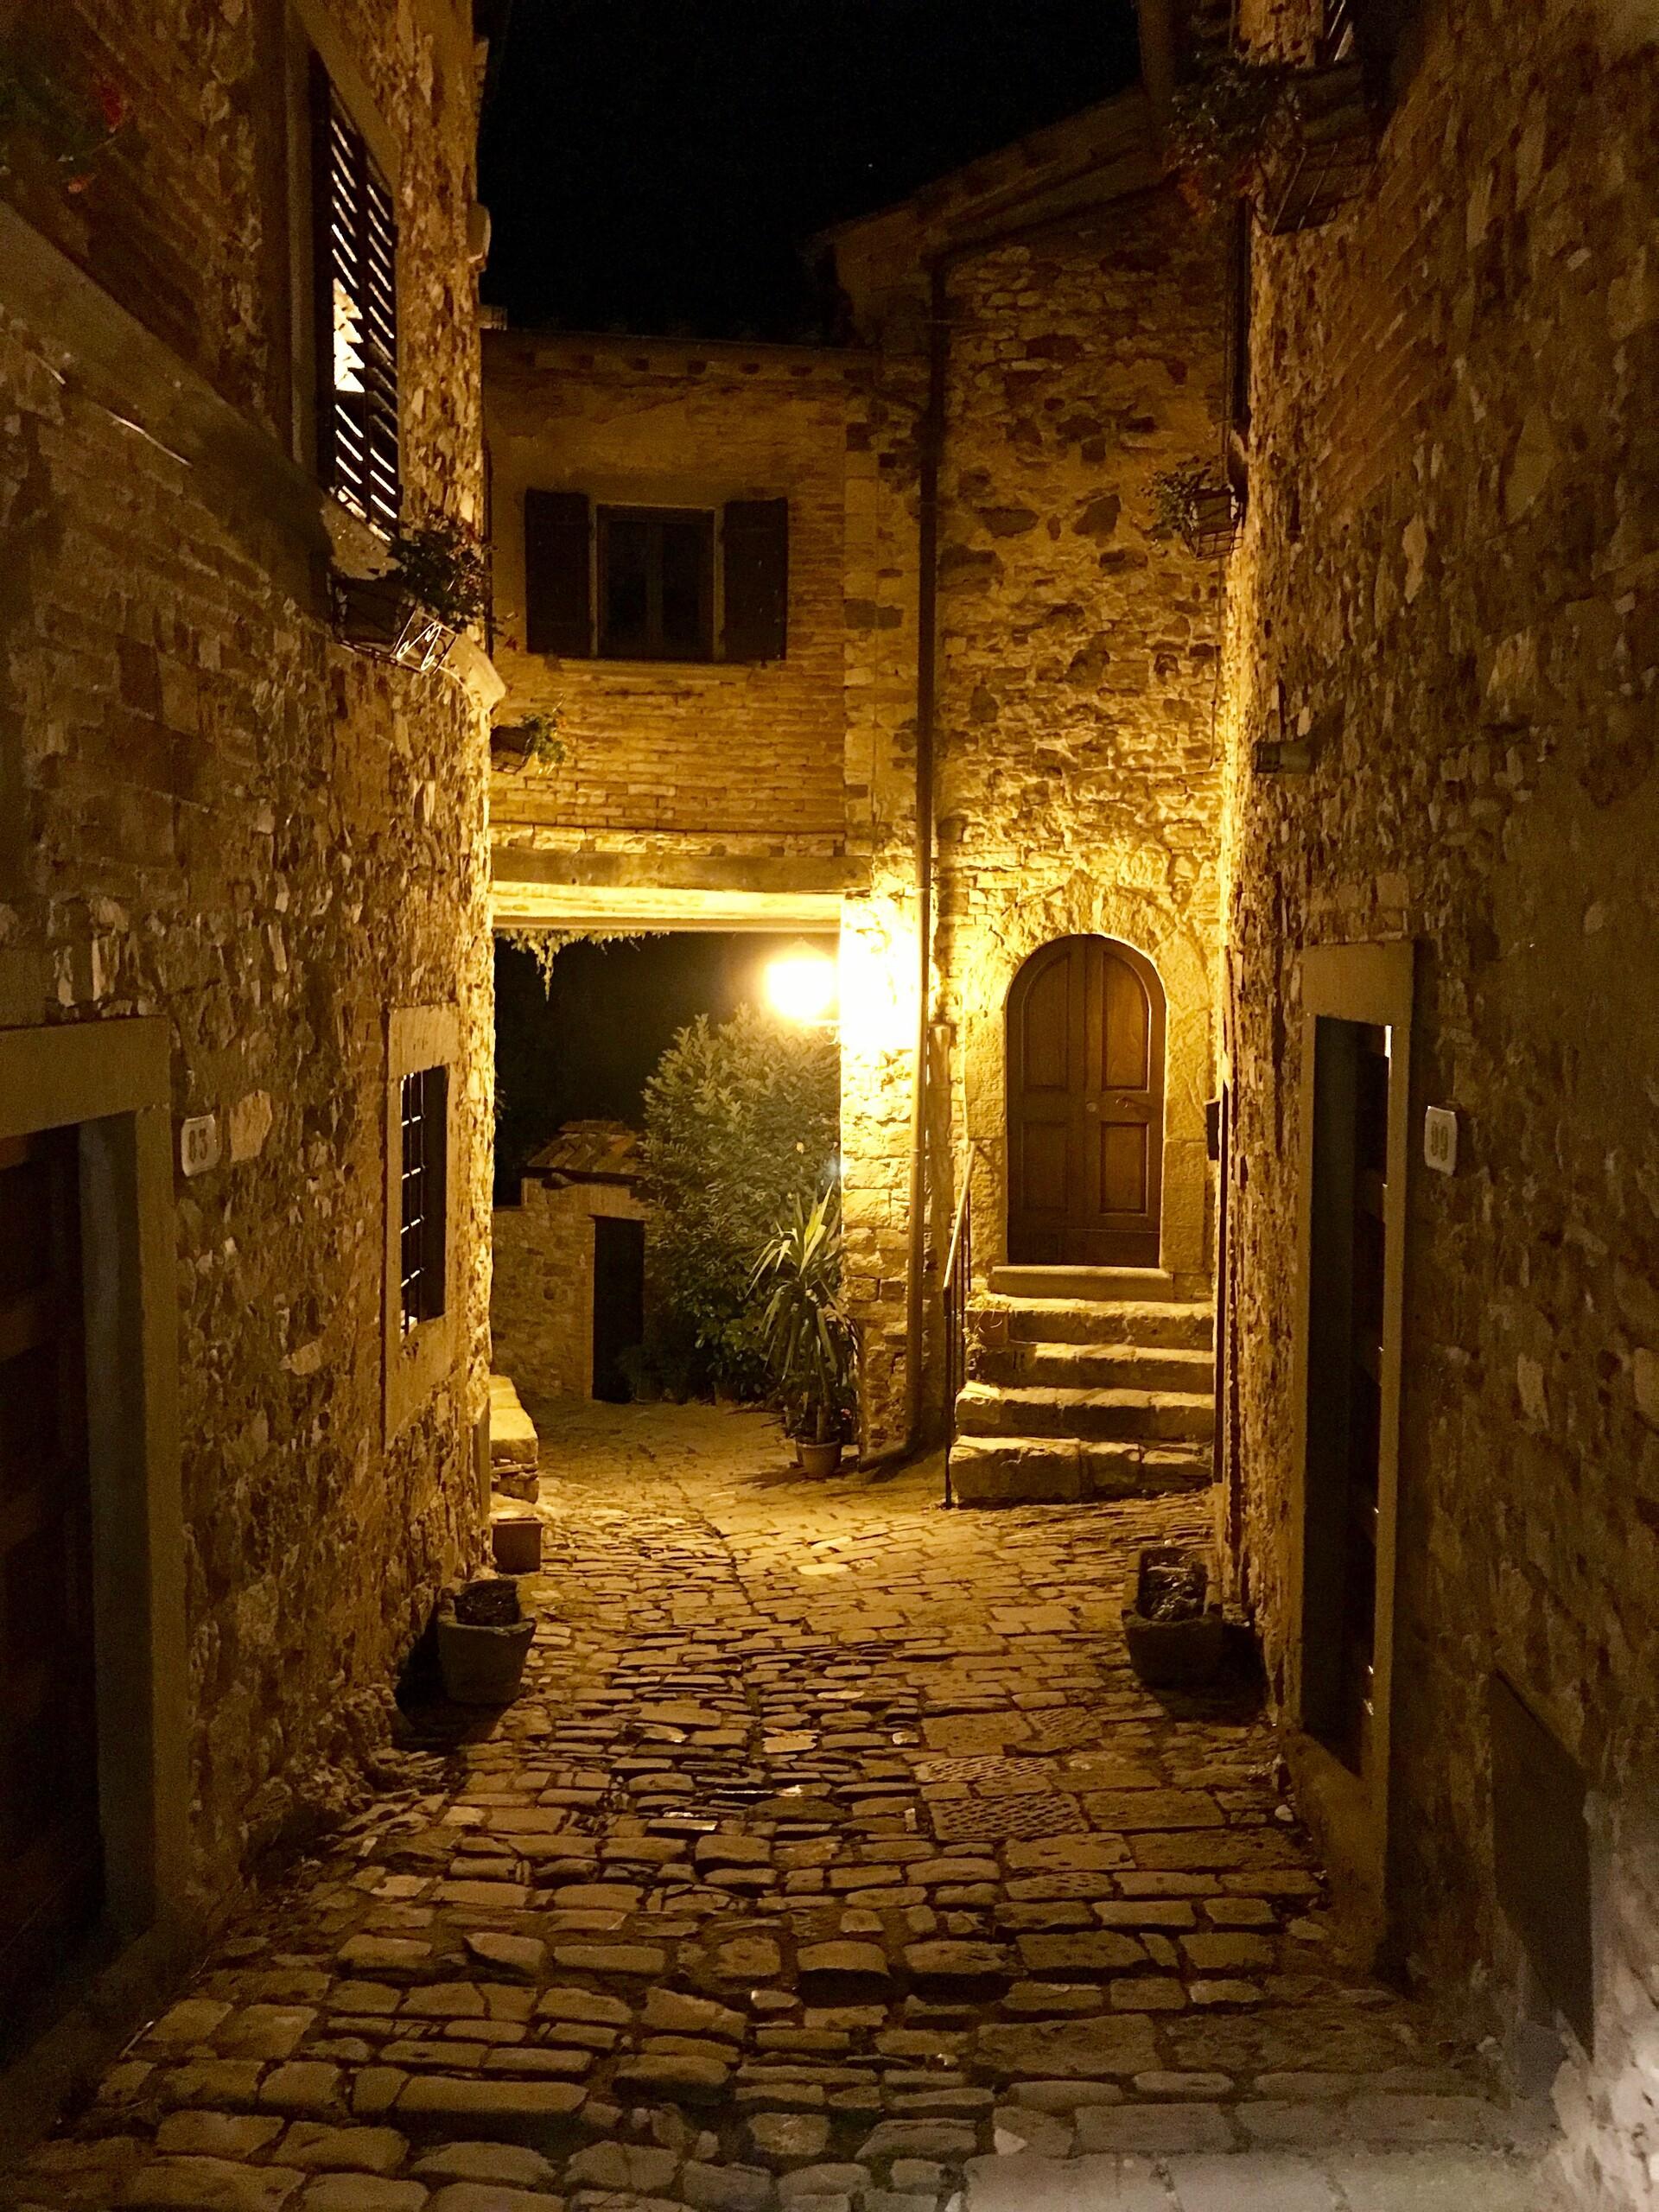 Lance laspina italia2017 spring montefioralleinsidevillage 19